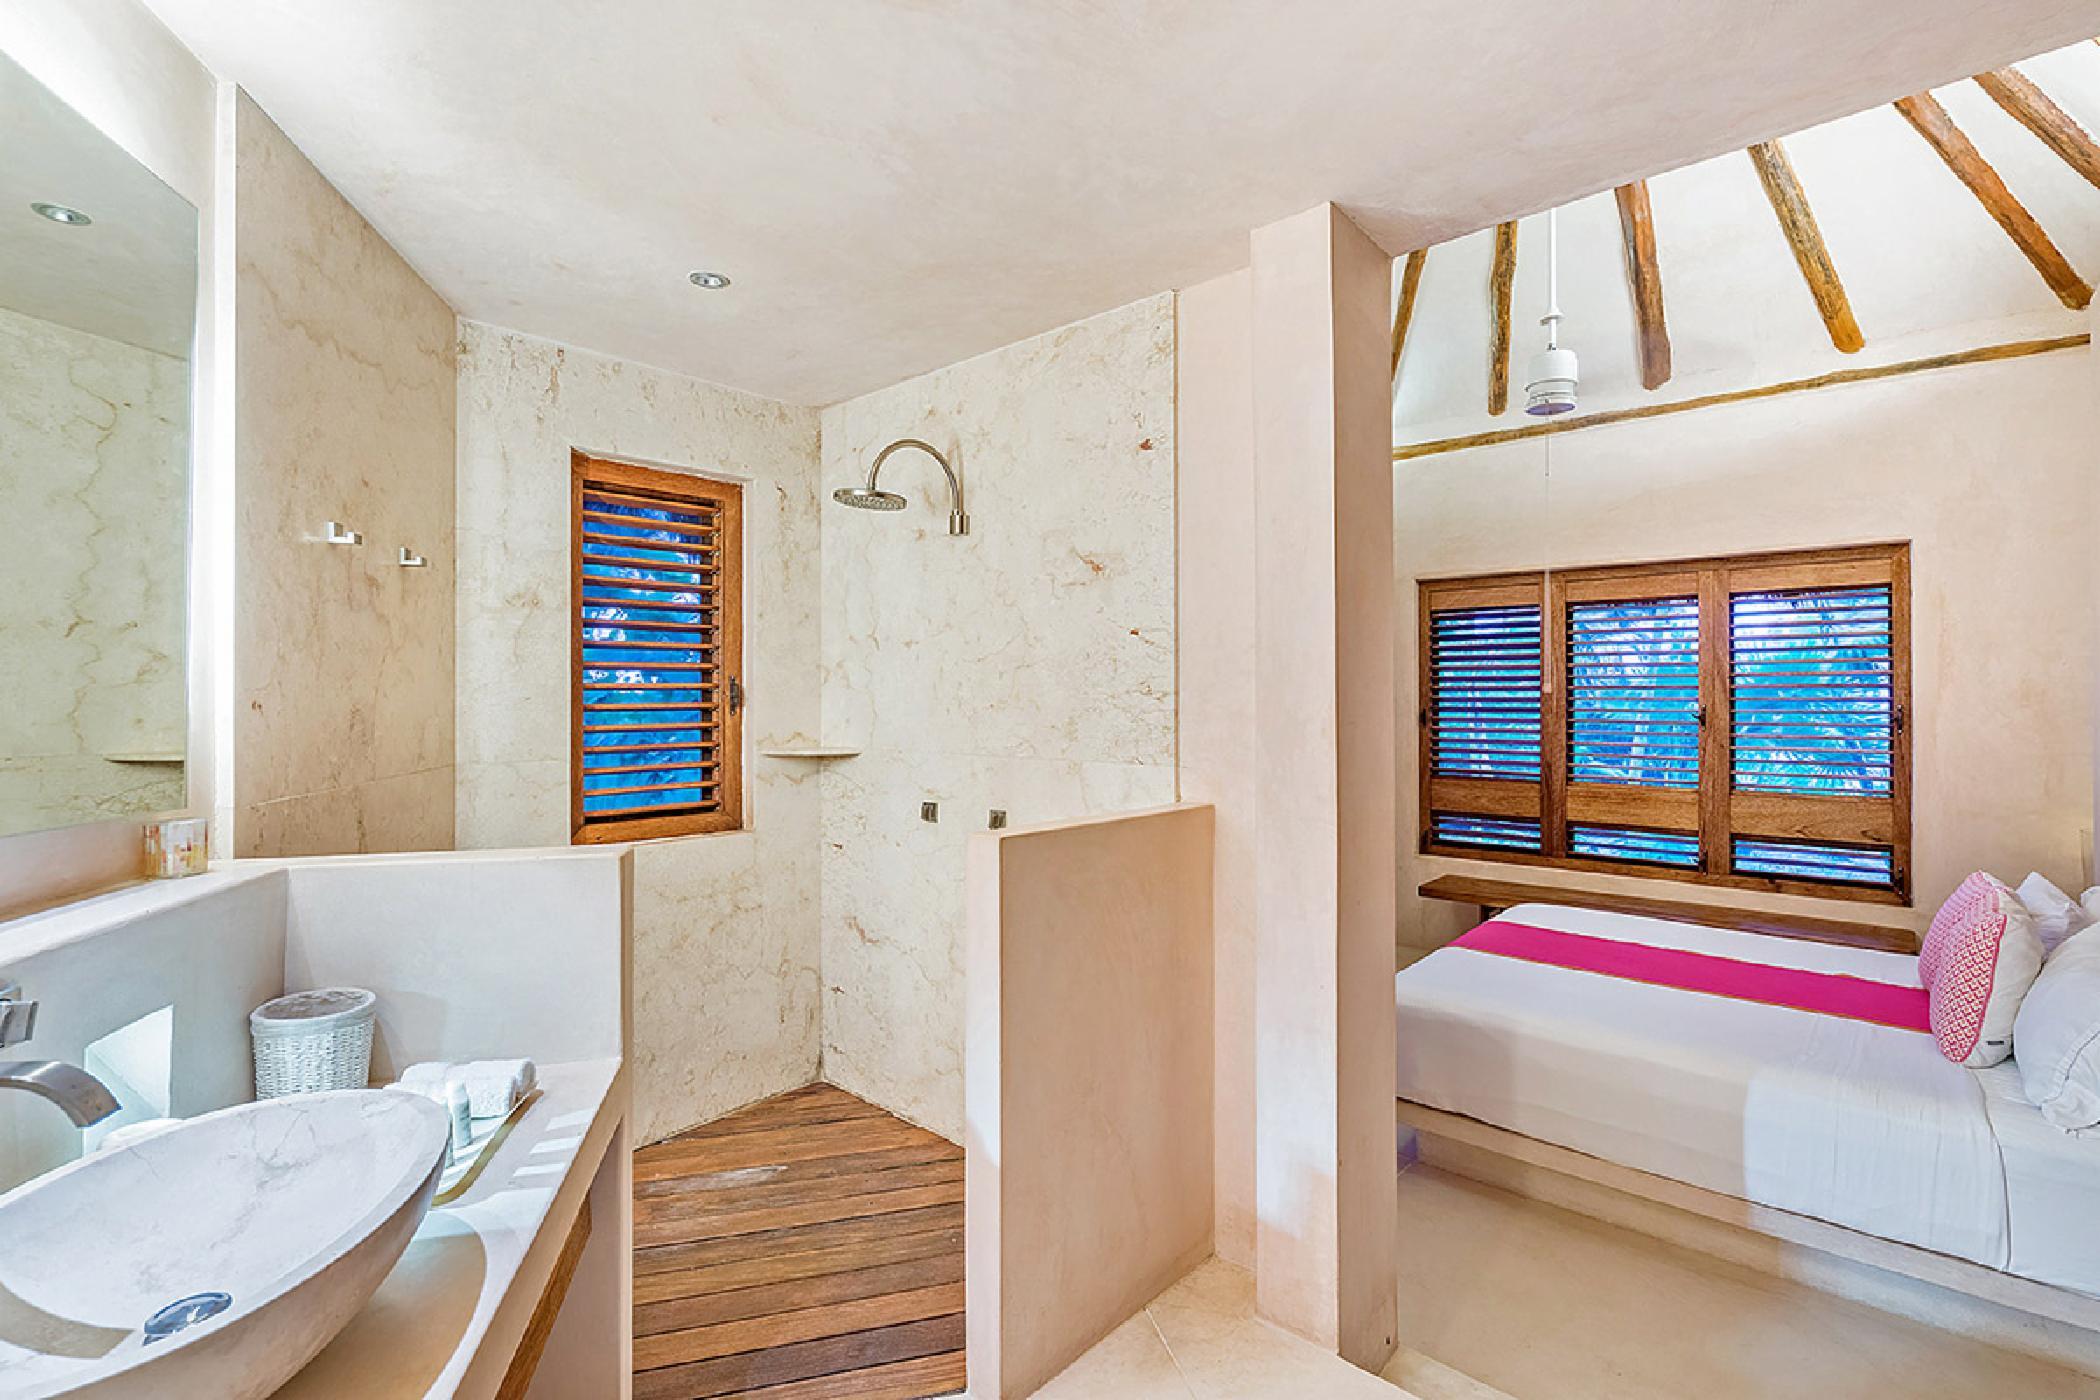 Maya_Luxe_Riviera_Maya_Luxury_Villas_Experiences_Sian_Kaan_Tulum_4_Bedrooms_Casa_Cantarena_22.jpg